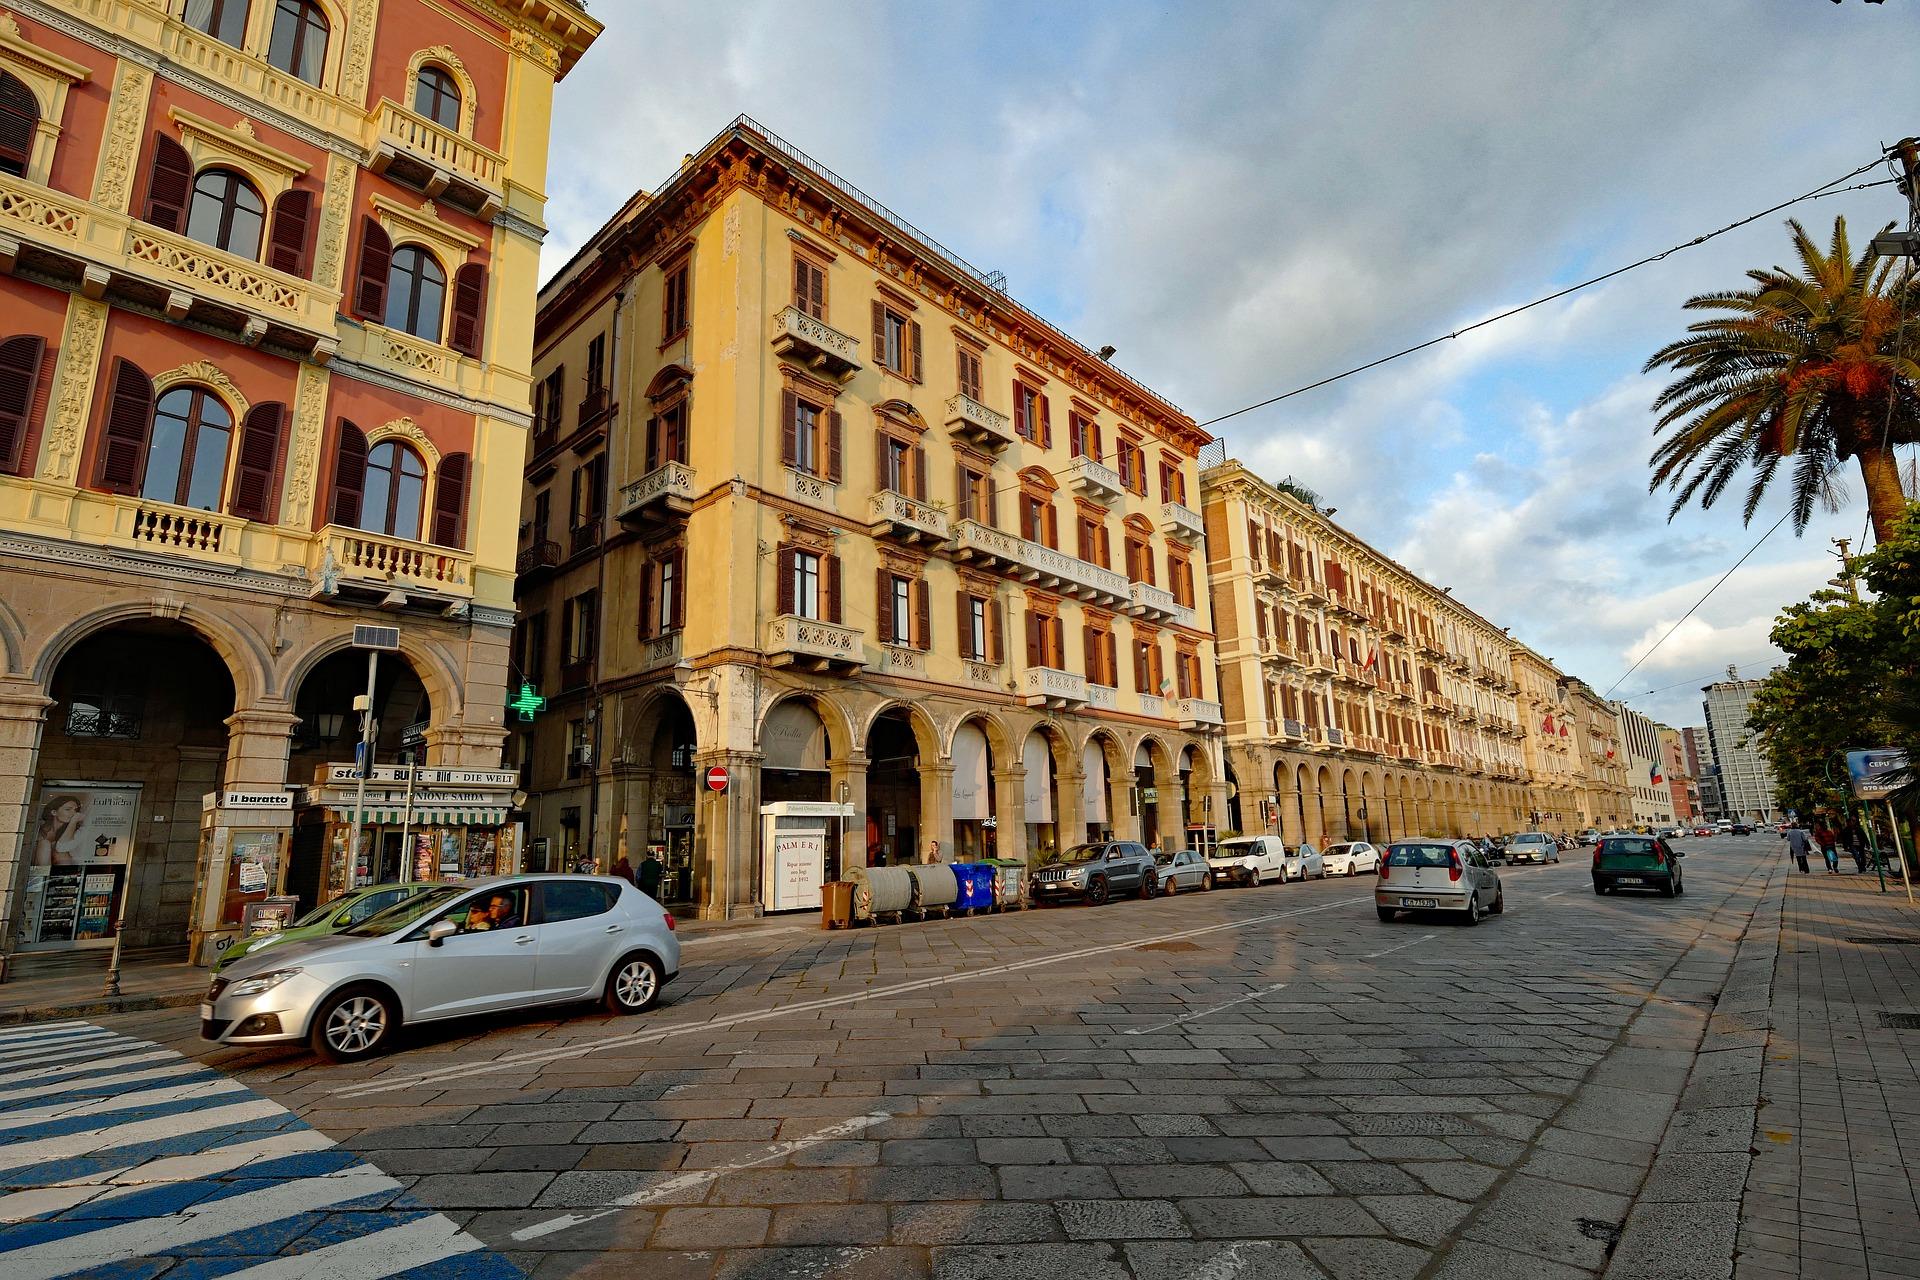 Prächtiger Boulevard in Cagliari